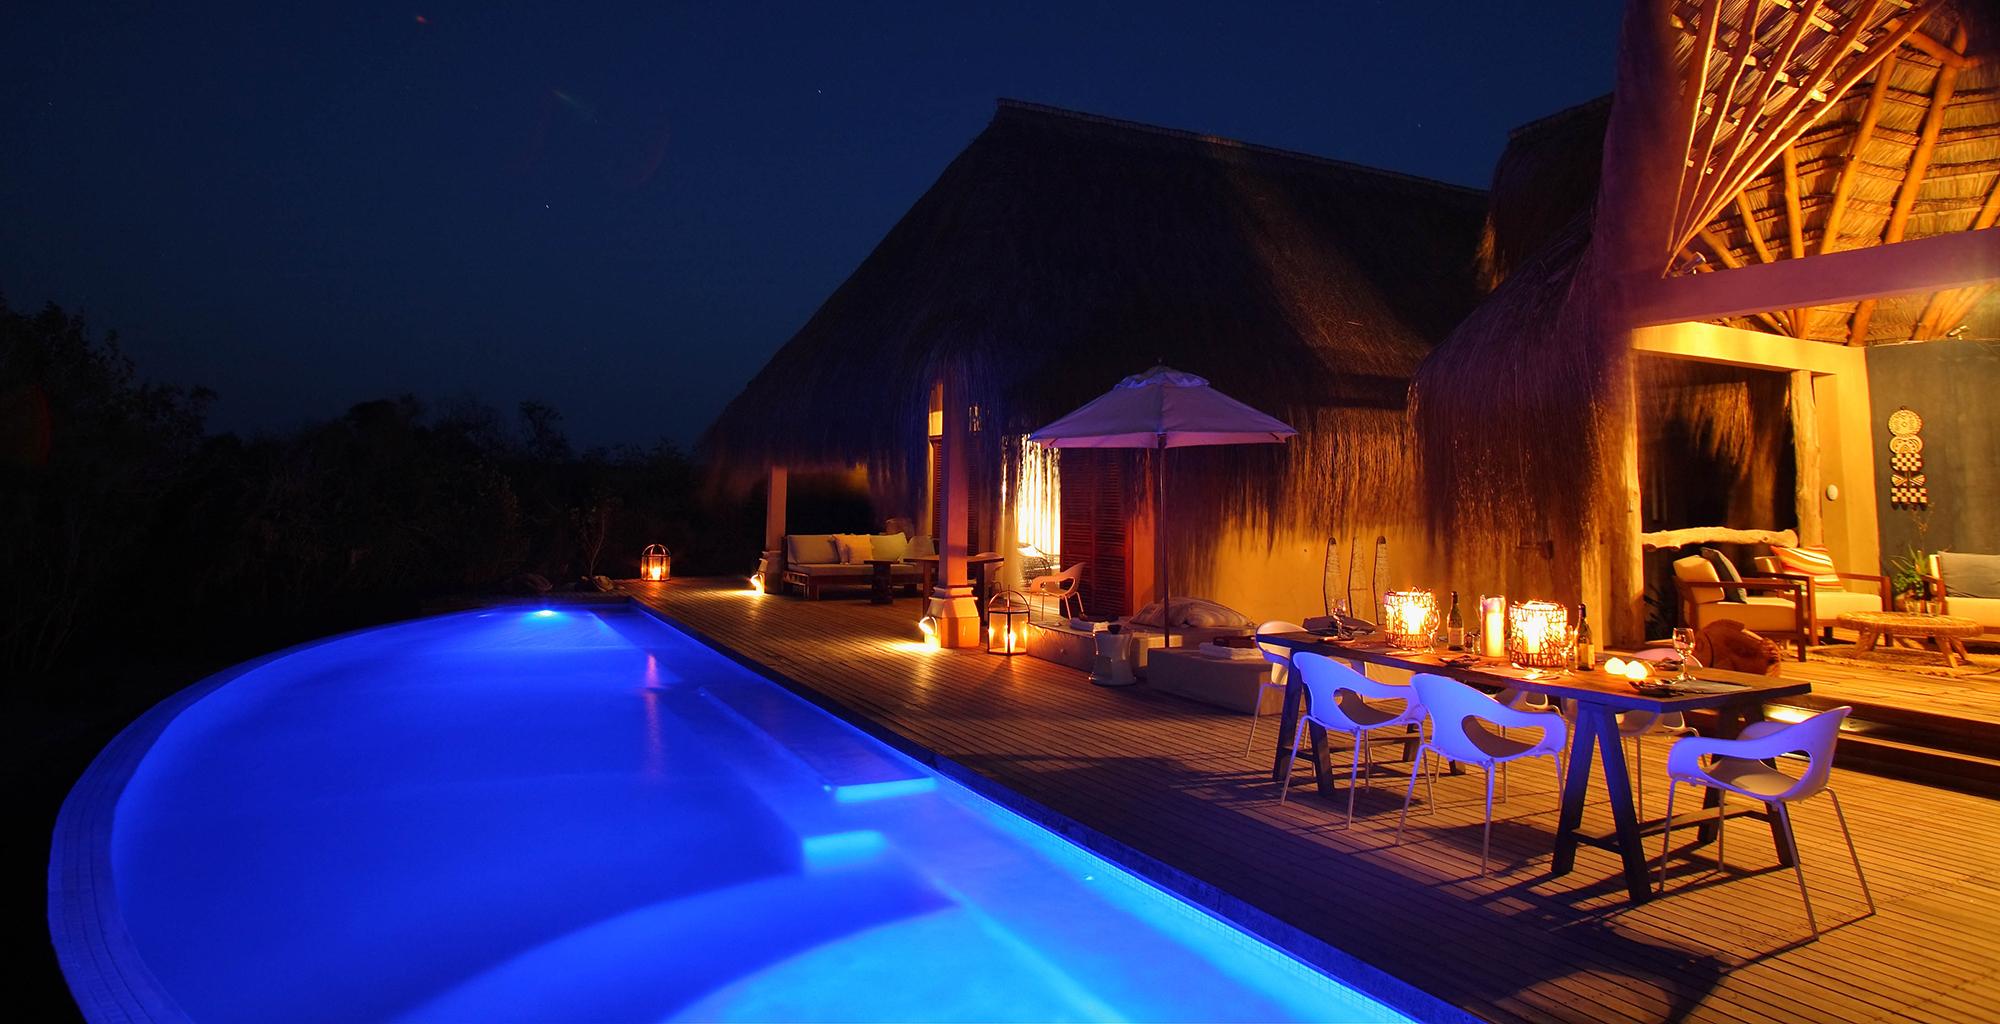 Mozambique-Bazaruto-Archipelago-Azura-Benguerra-Presidential-Swimming-Pool